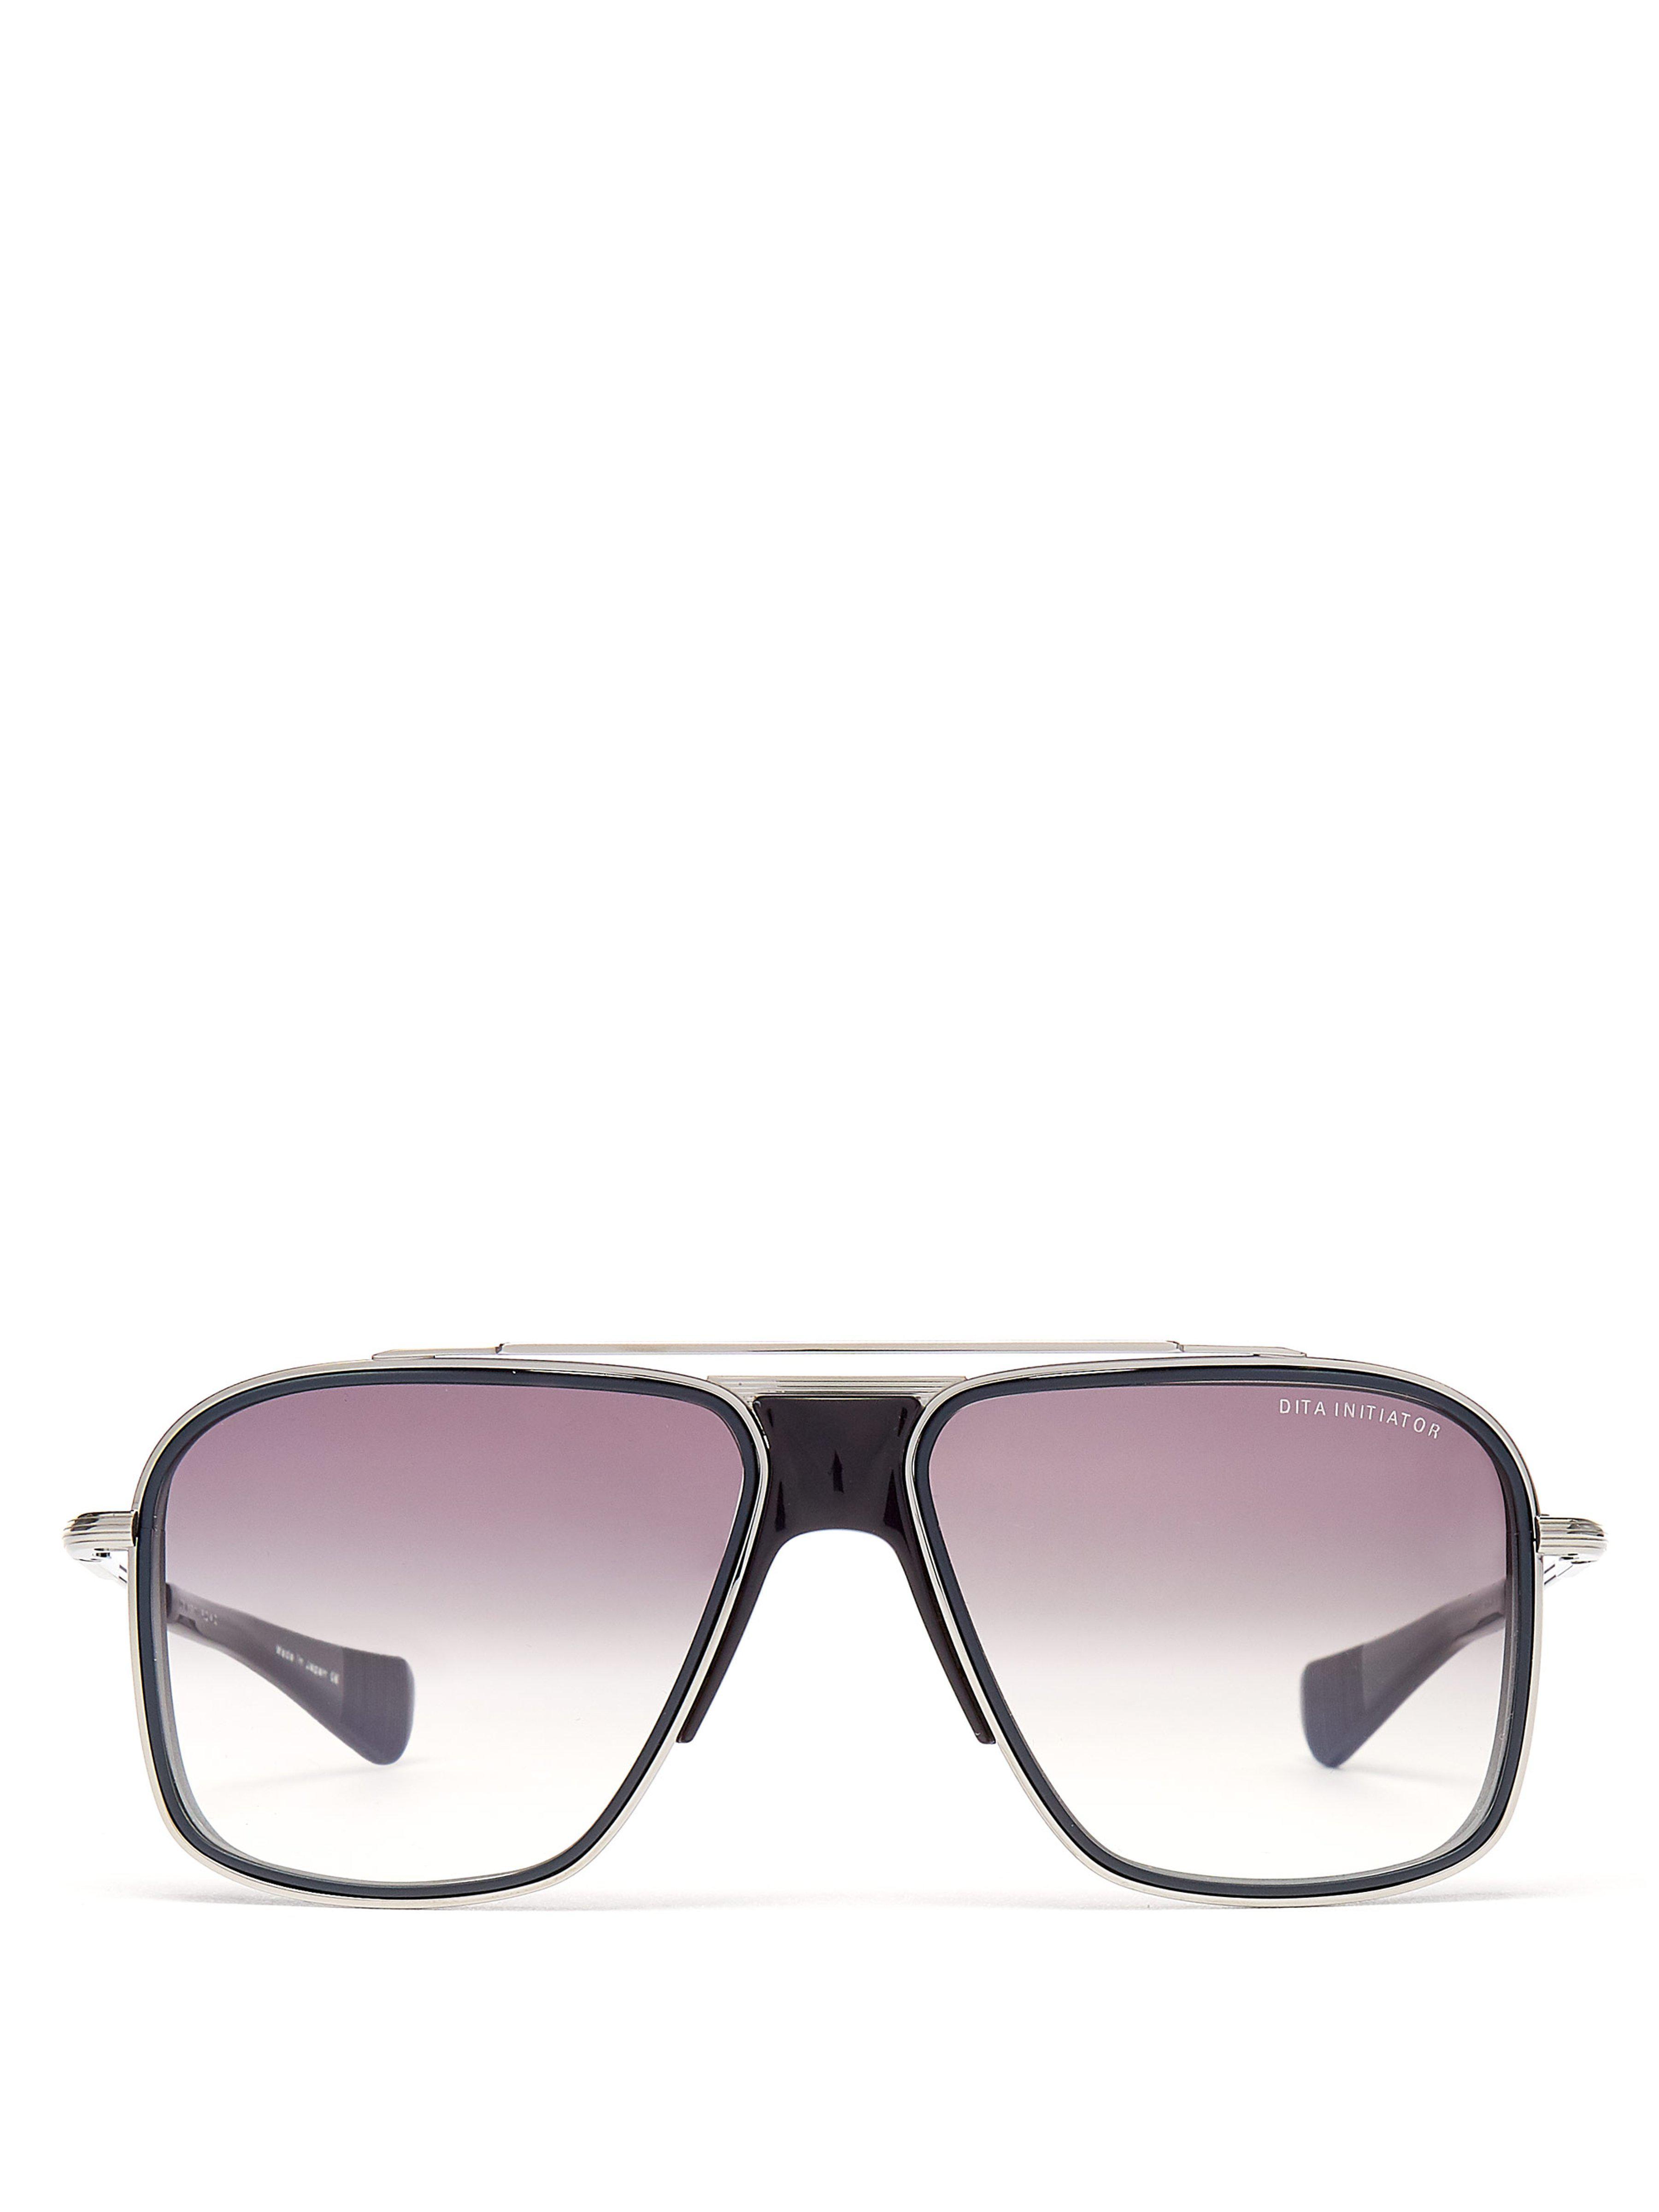 ec1b1448658 Dita Eyewear Initiator Aviator D Frame Titanium Sunglasses in Black ...